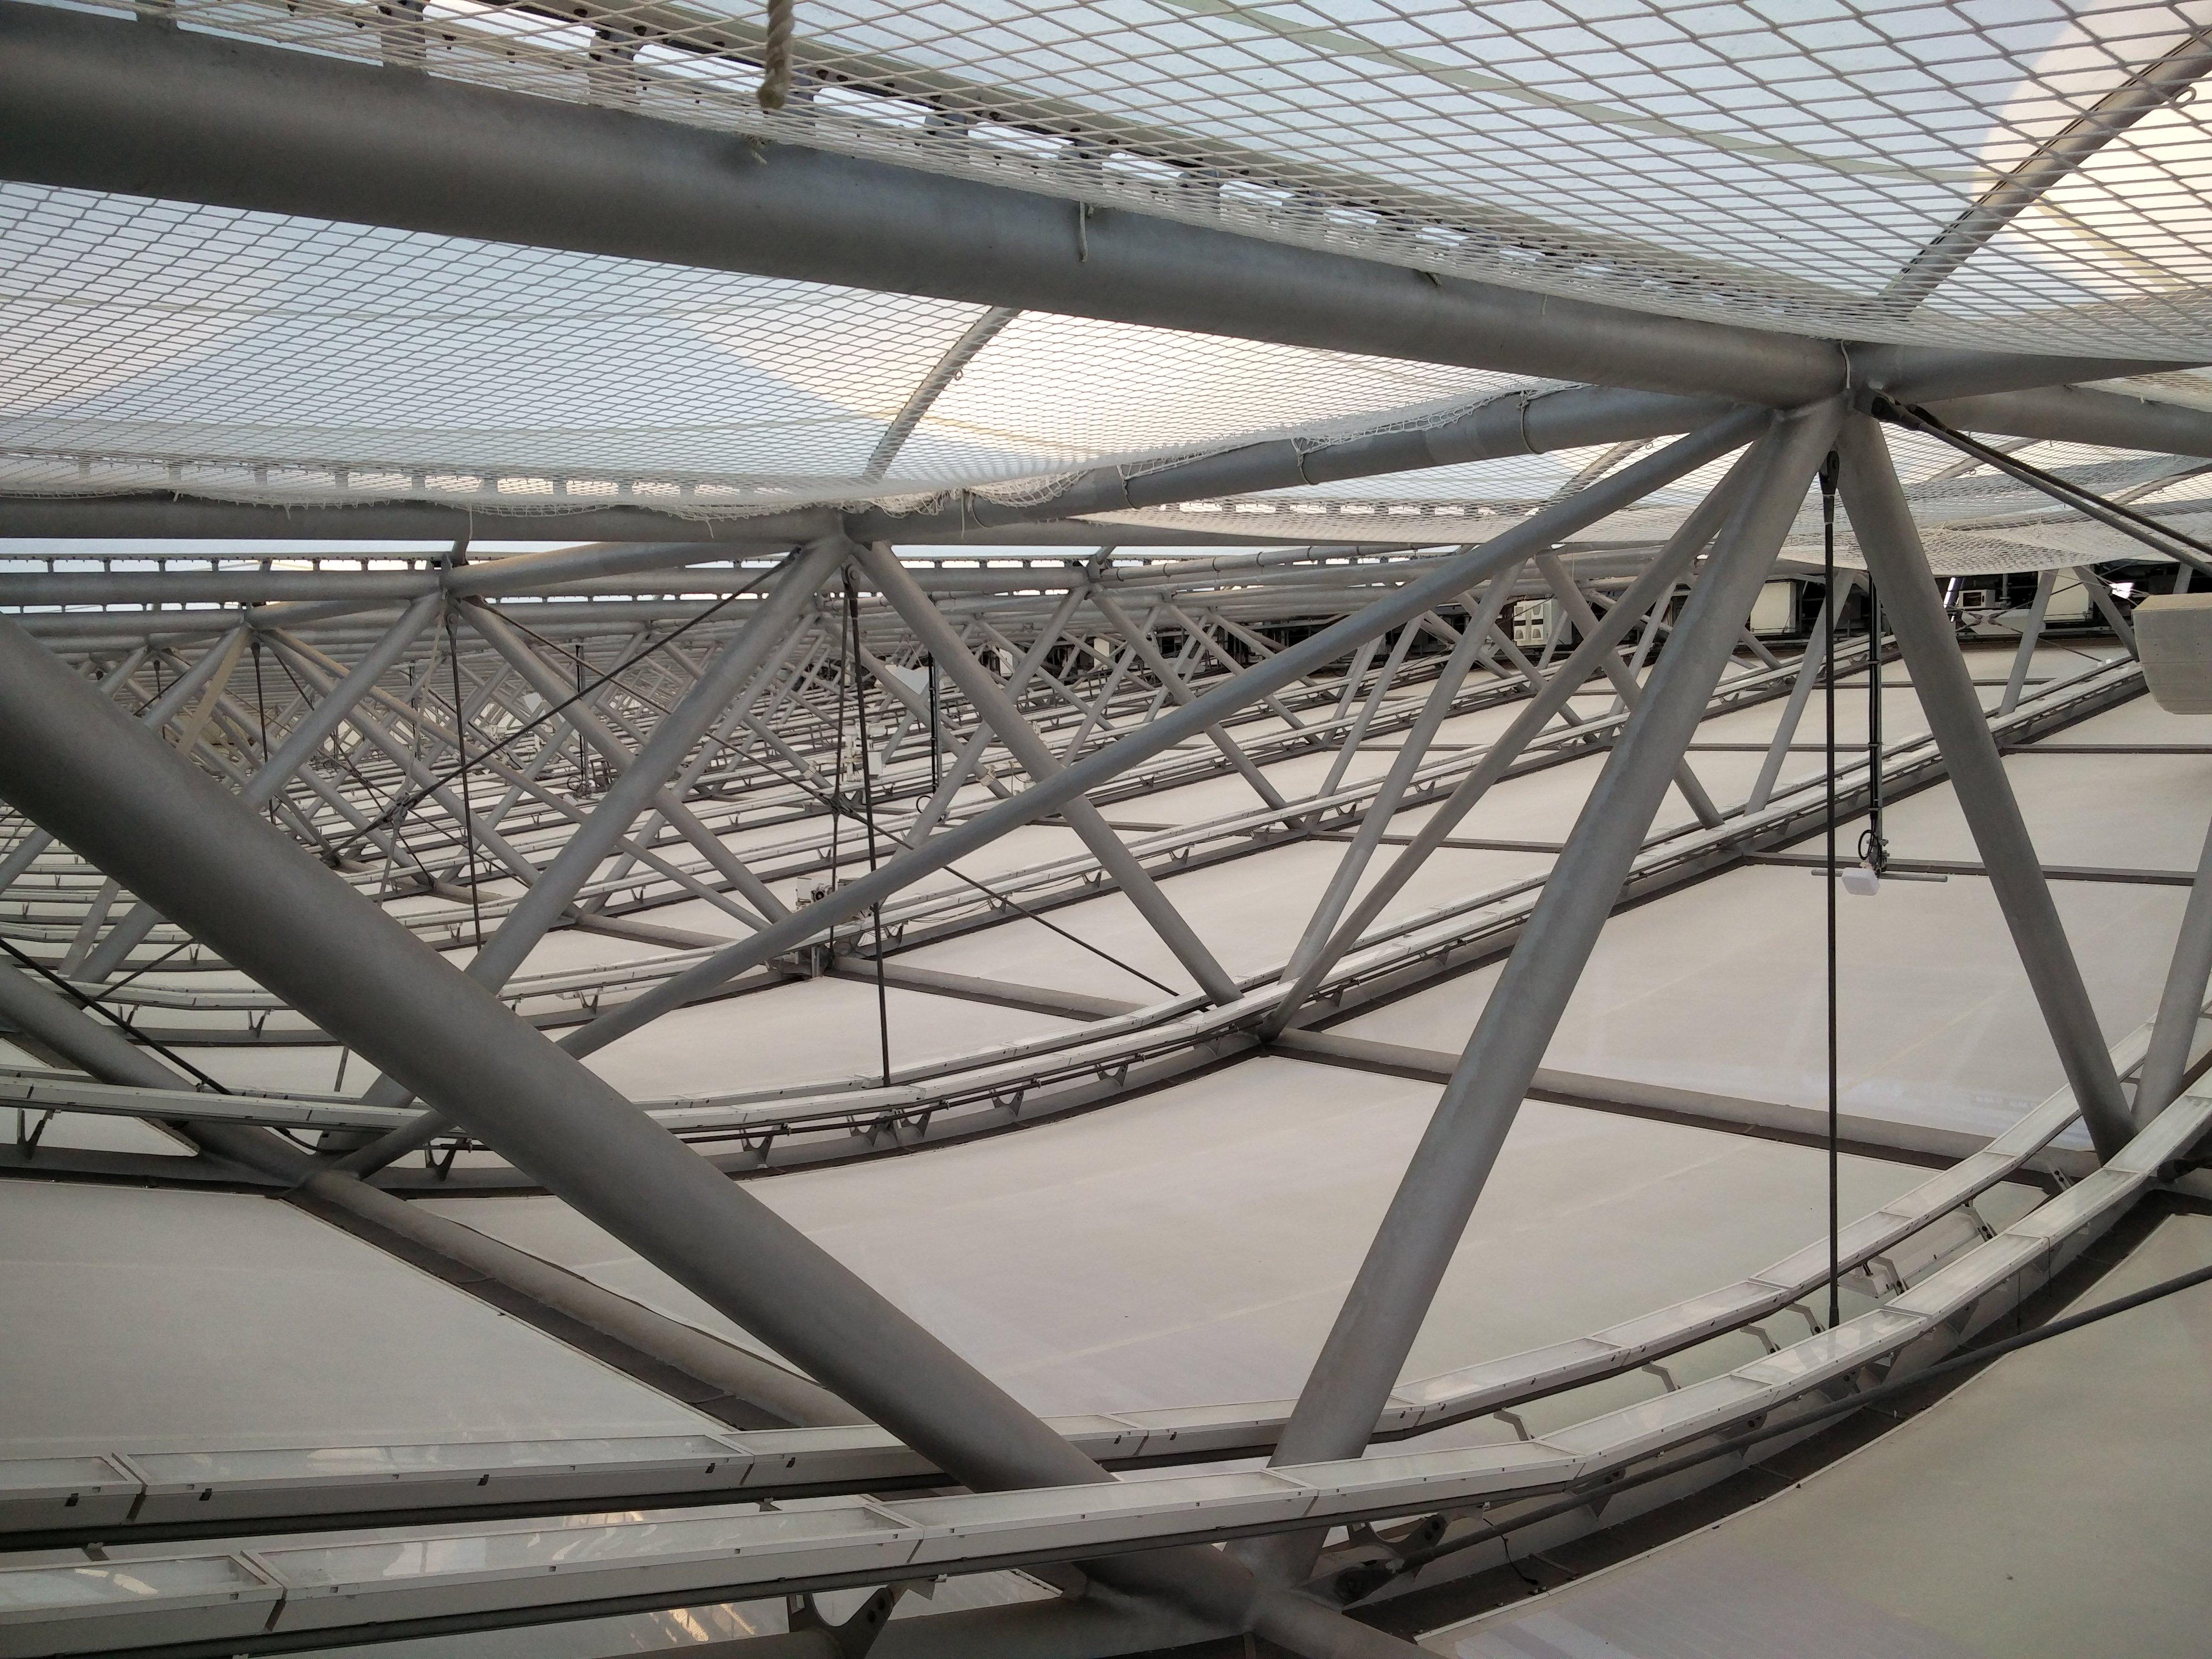 Dachkonstruktion des Olympiastadion